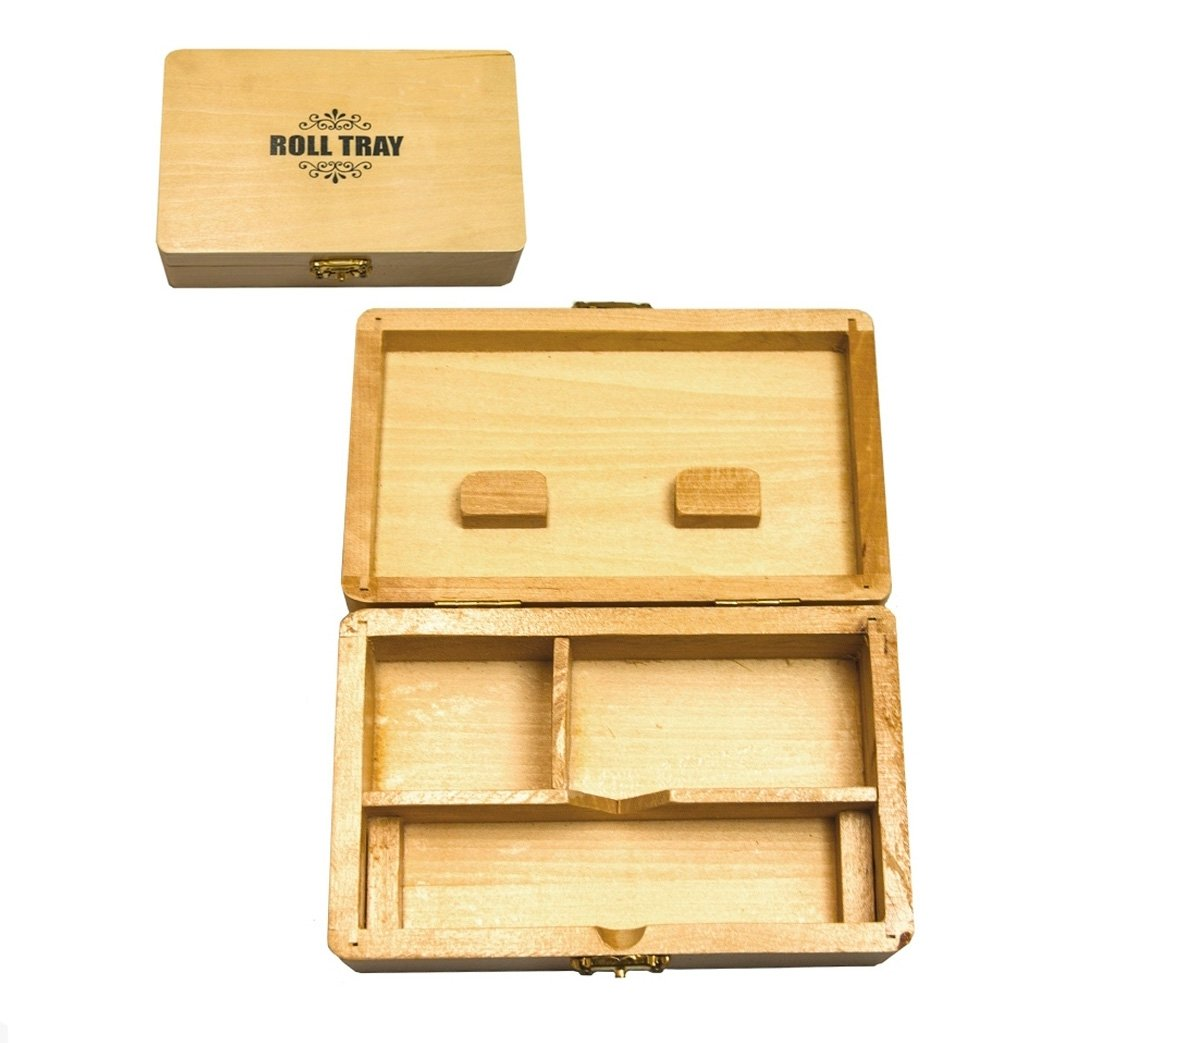 Medium Houten Roll & Stash Box - 15 x 10 cm - Waterpijp-bong.nl